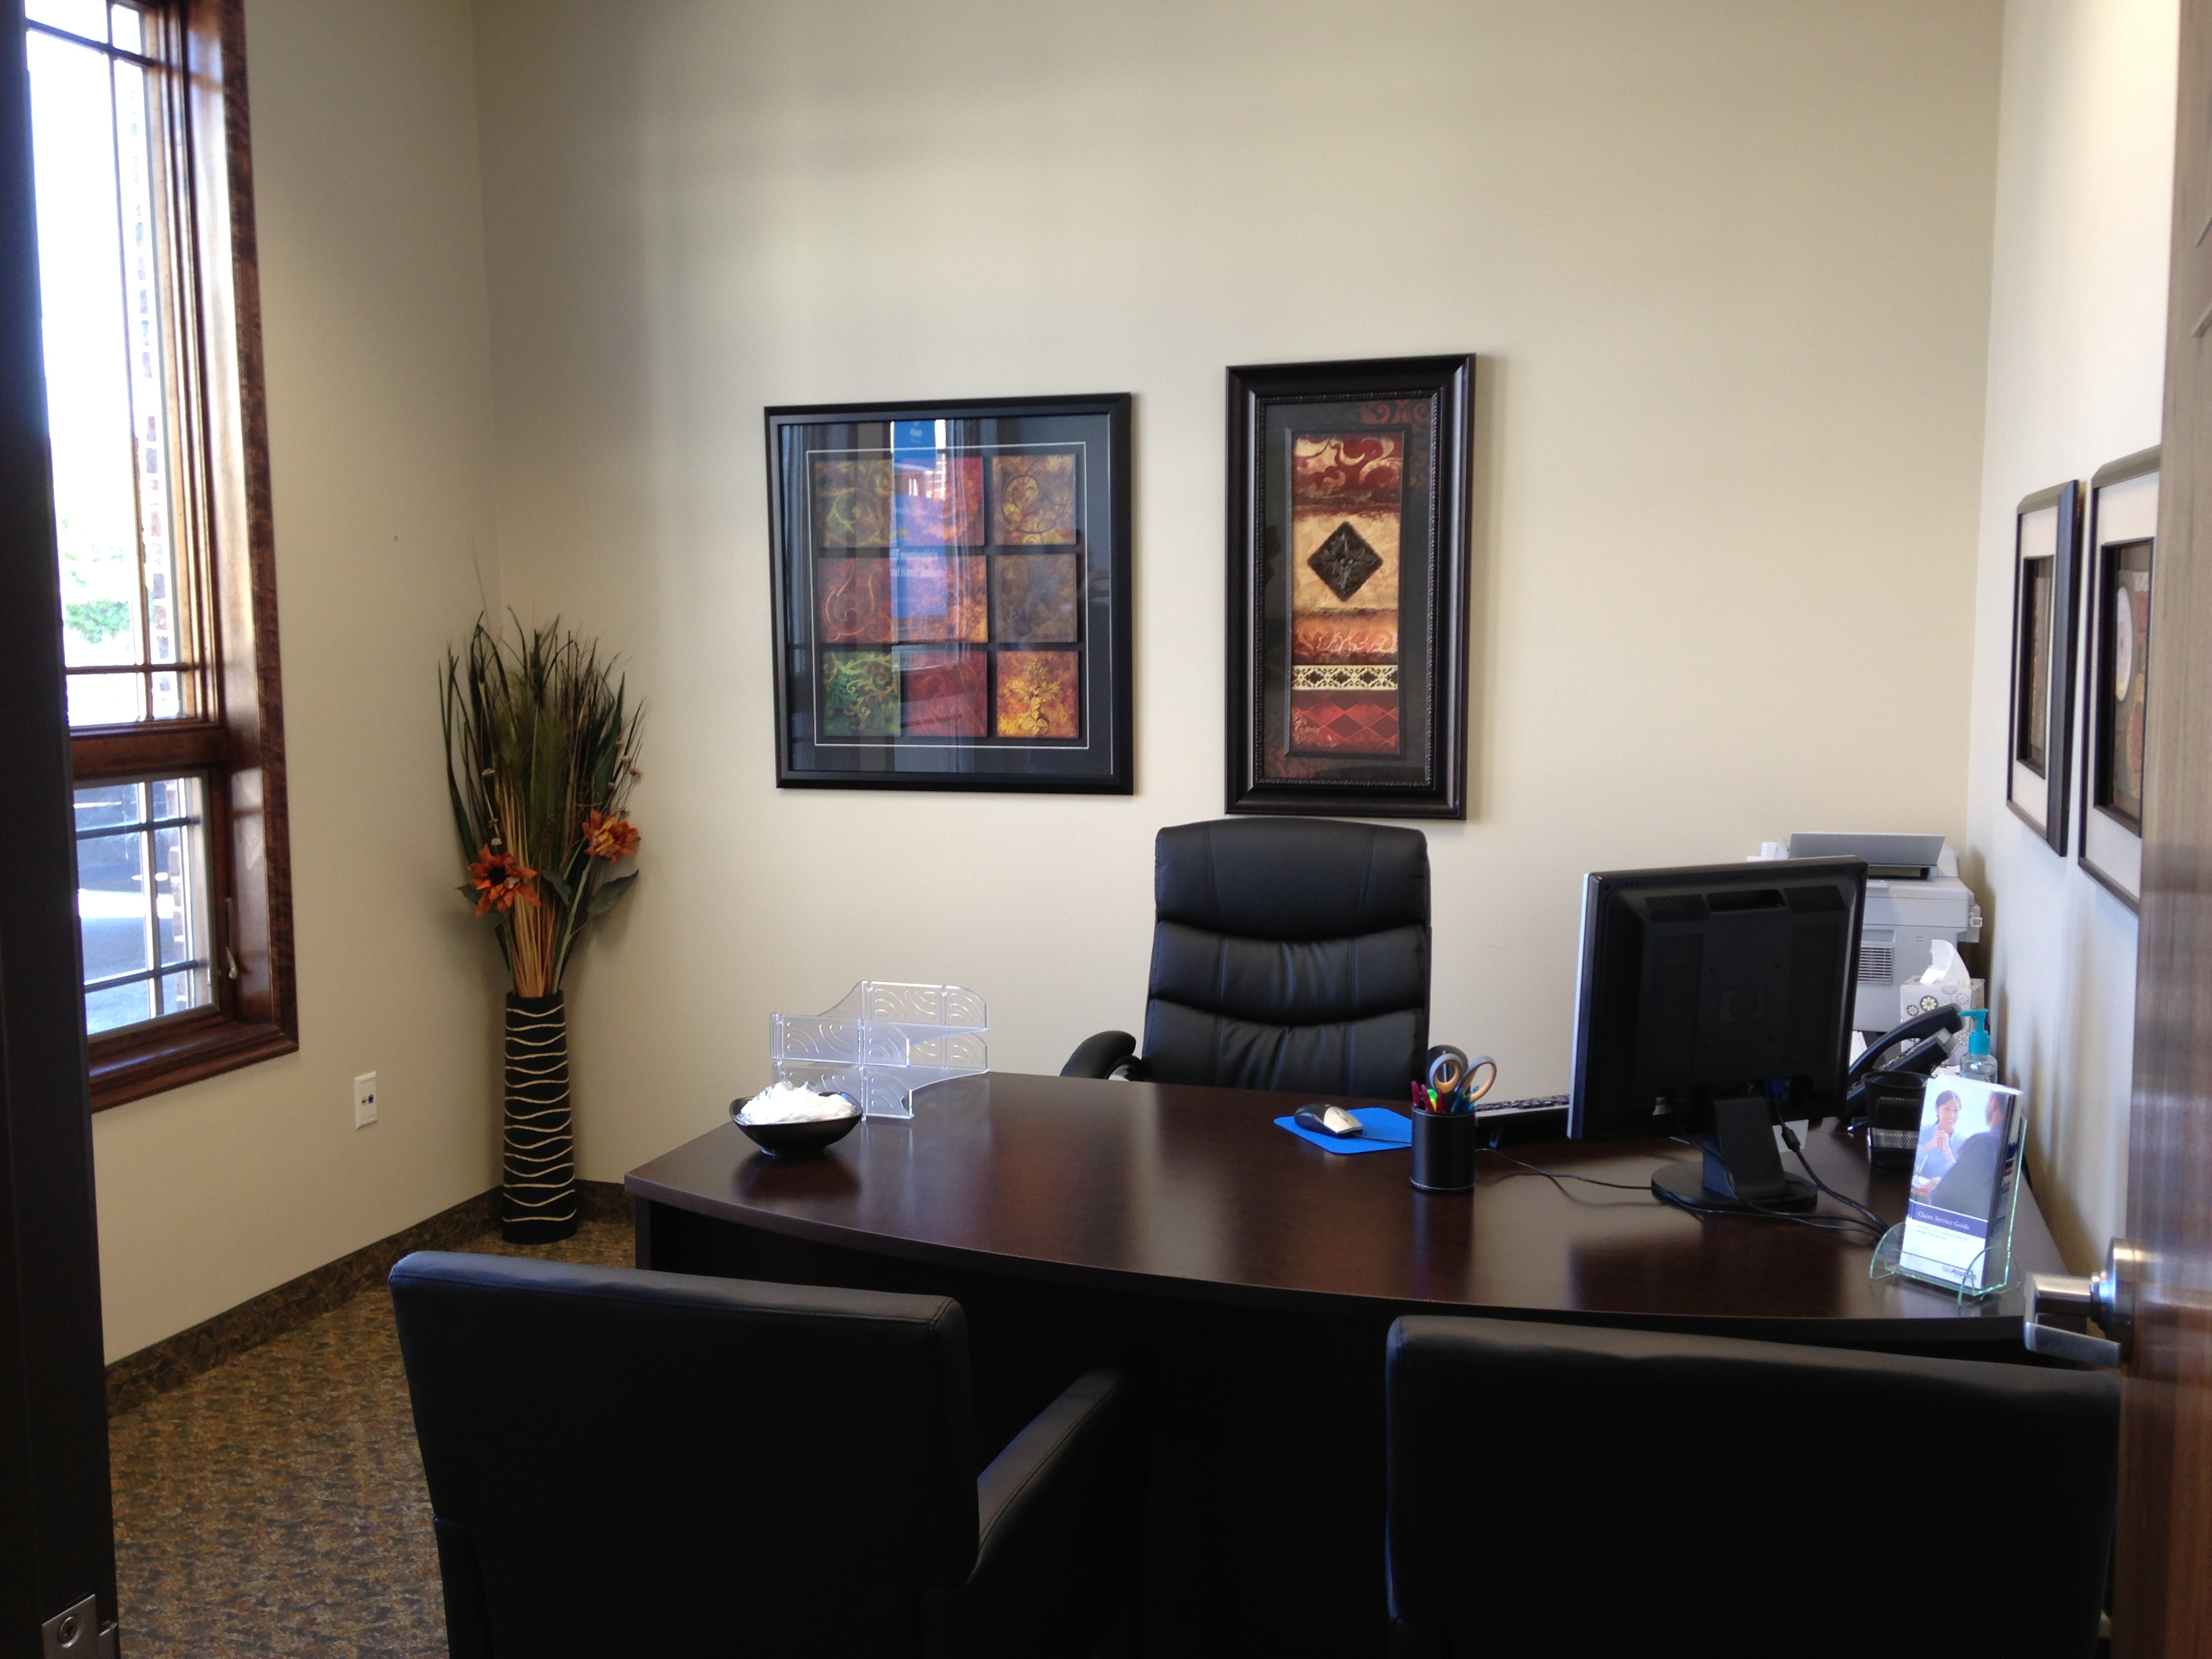 Jeff Babisz: Allstate Insurance image 3